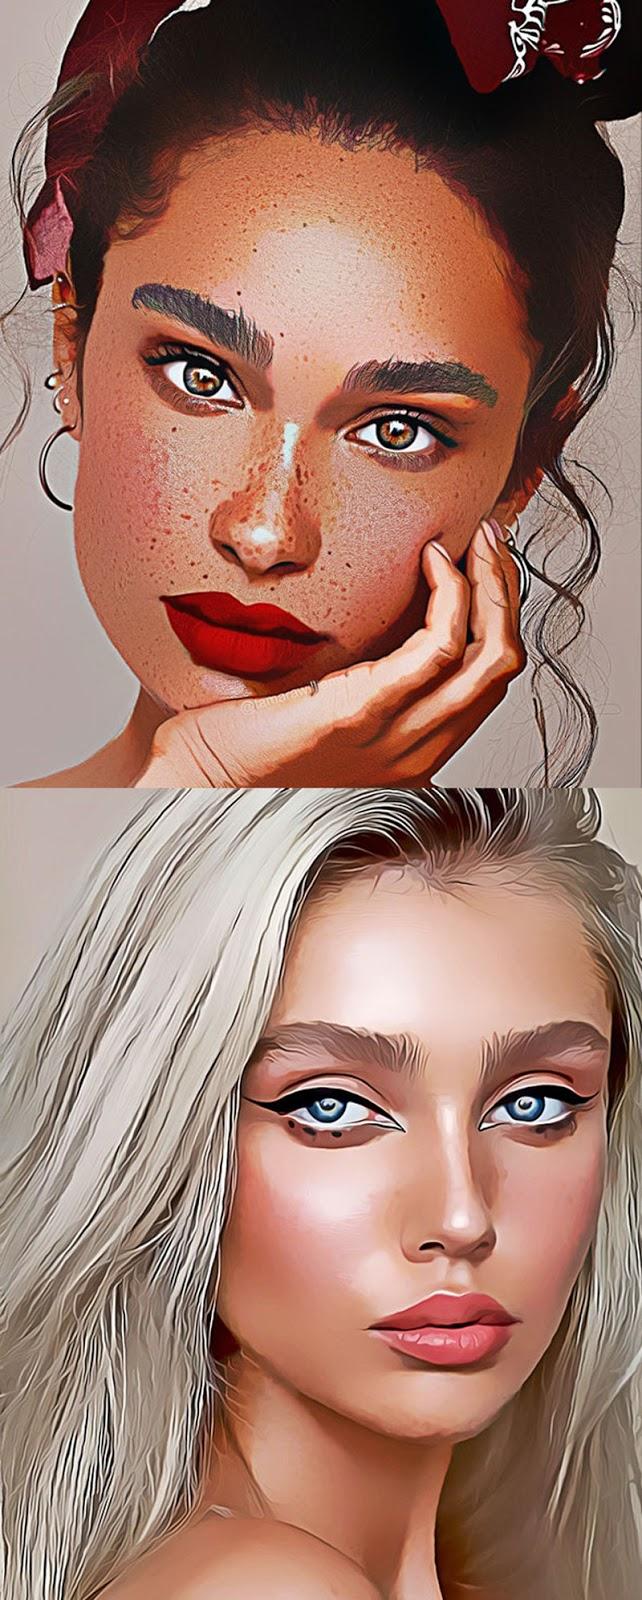 Cartooniz-painting Photoshop Action 25990817